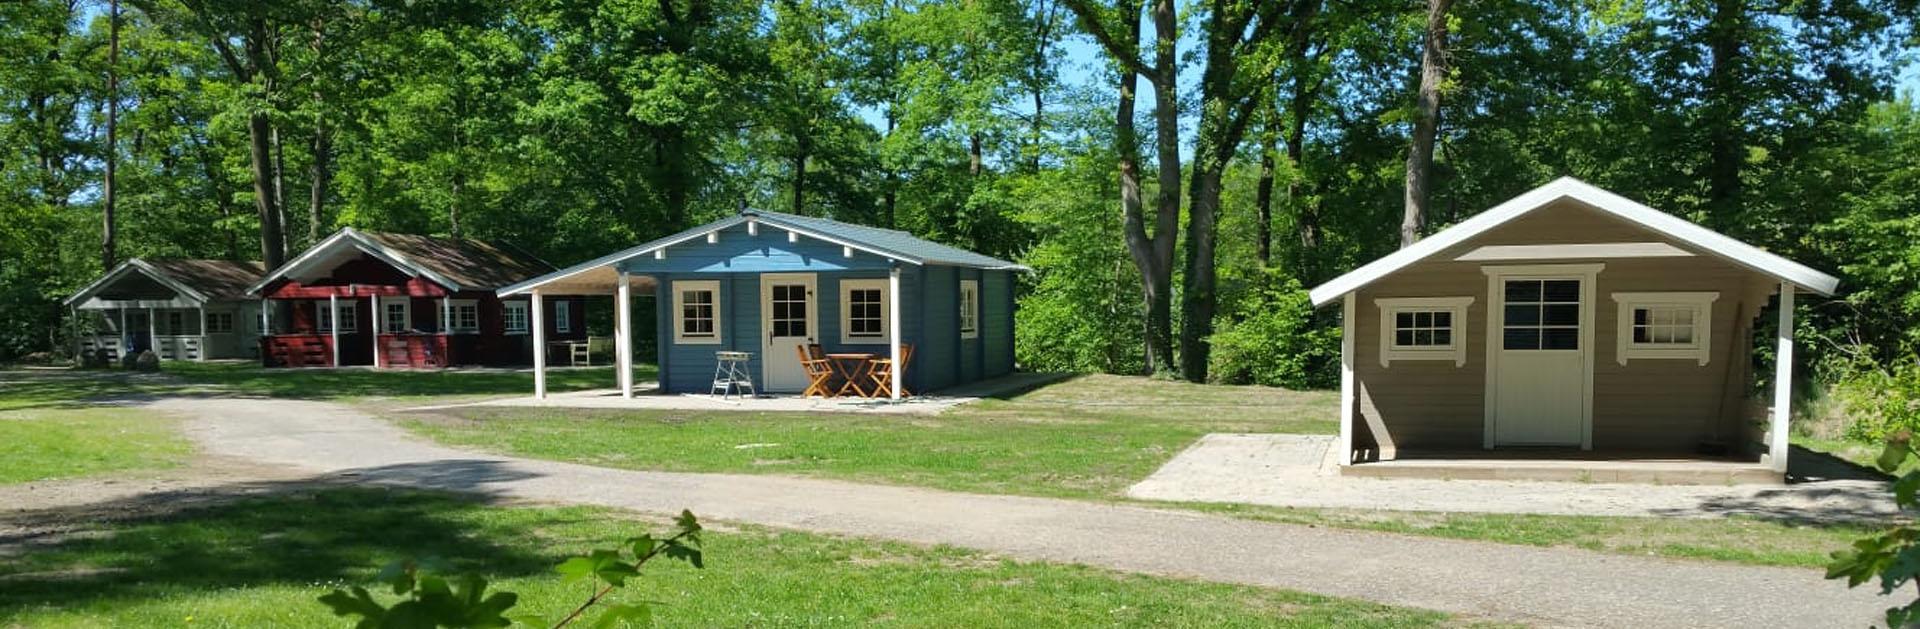 Camping Lansbulten - Aalten